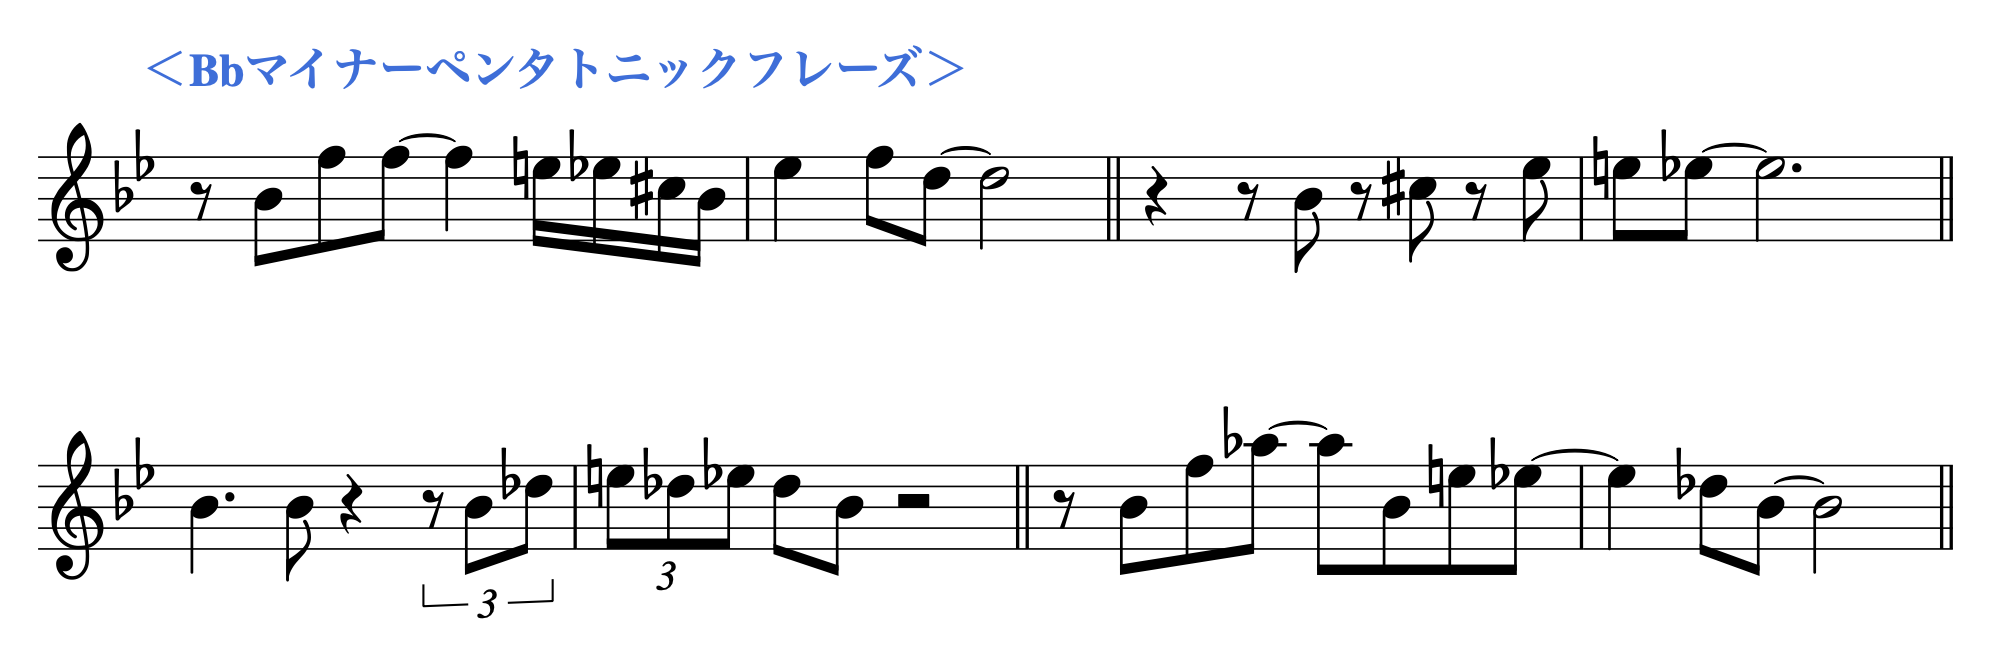 Bbpenta-minor